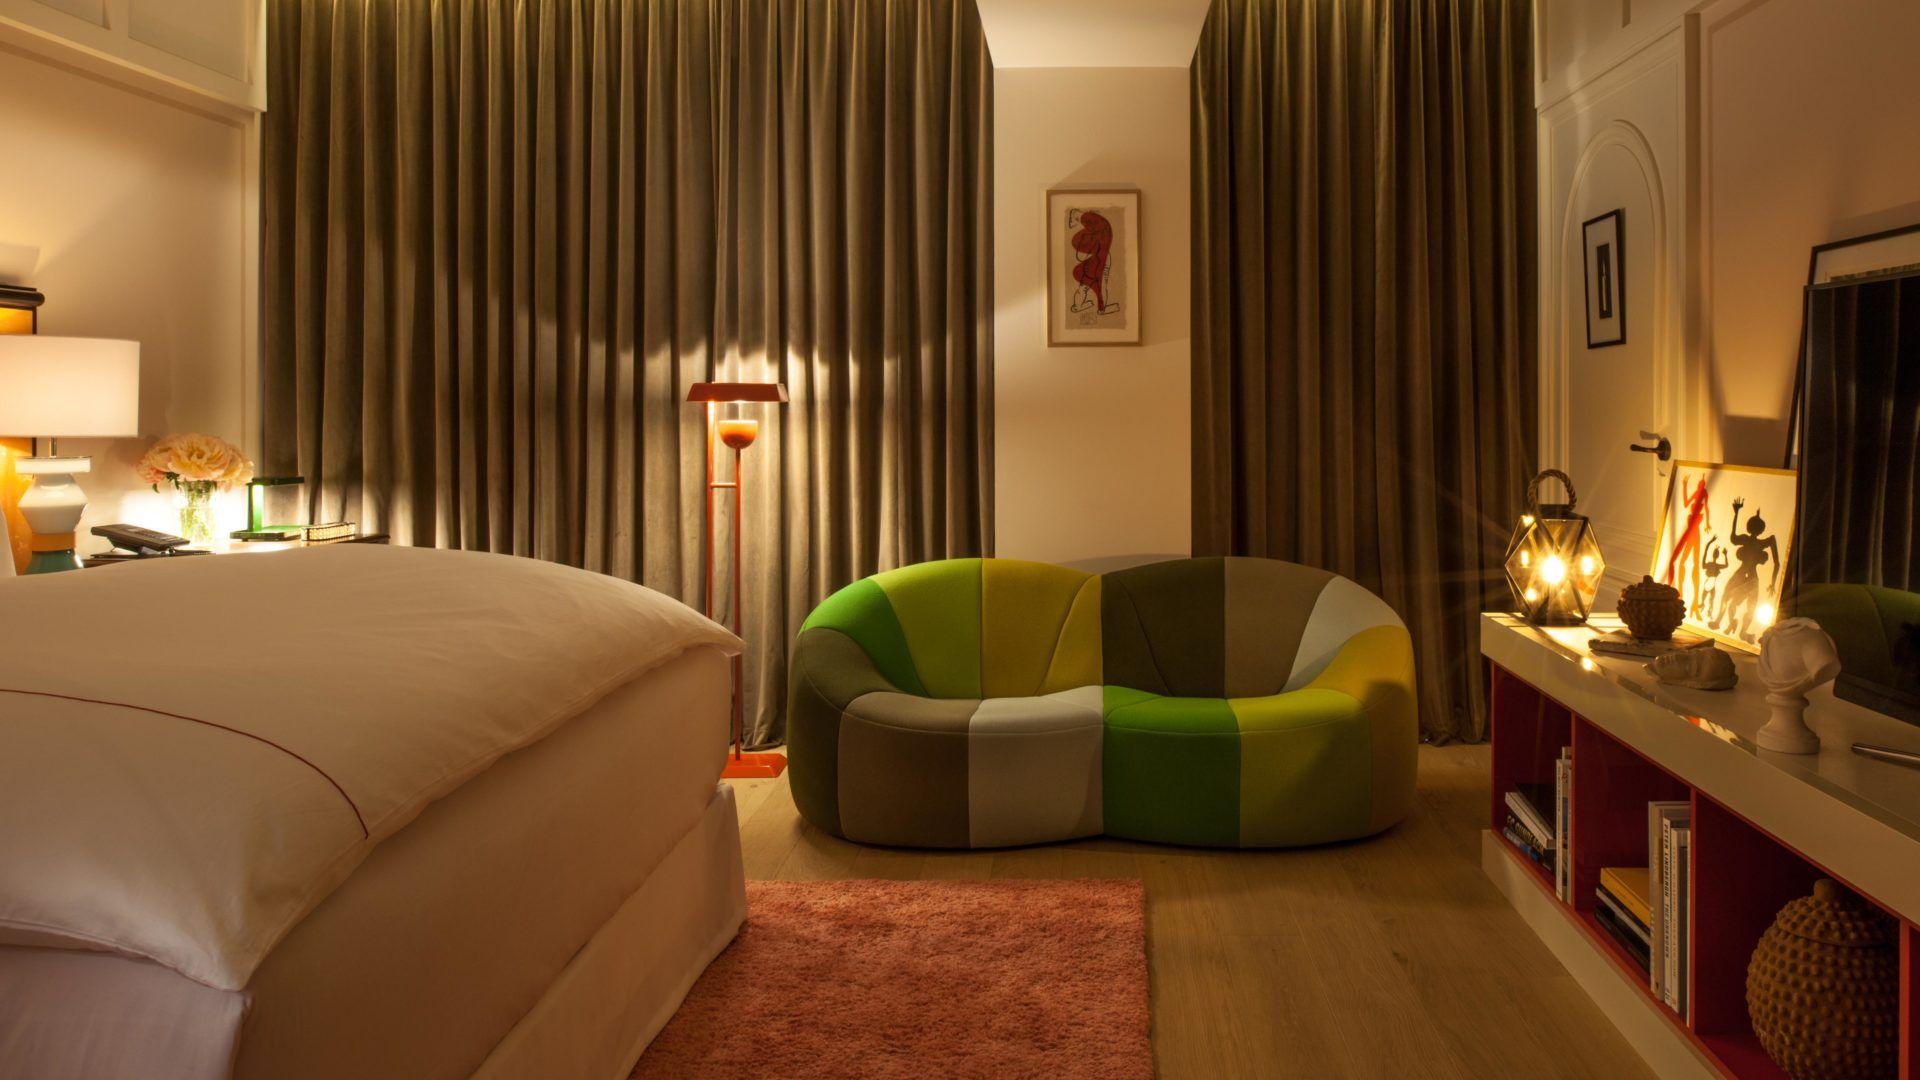 SINNER_Junior_suite_paris_hotel_5_etoiles_Guillaume_de_Laubier